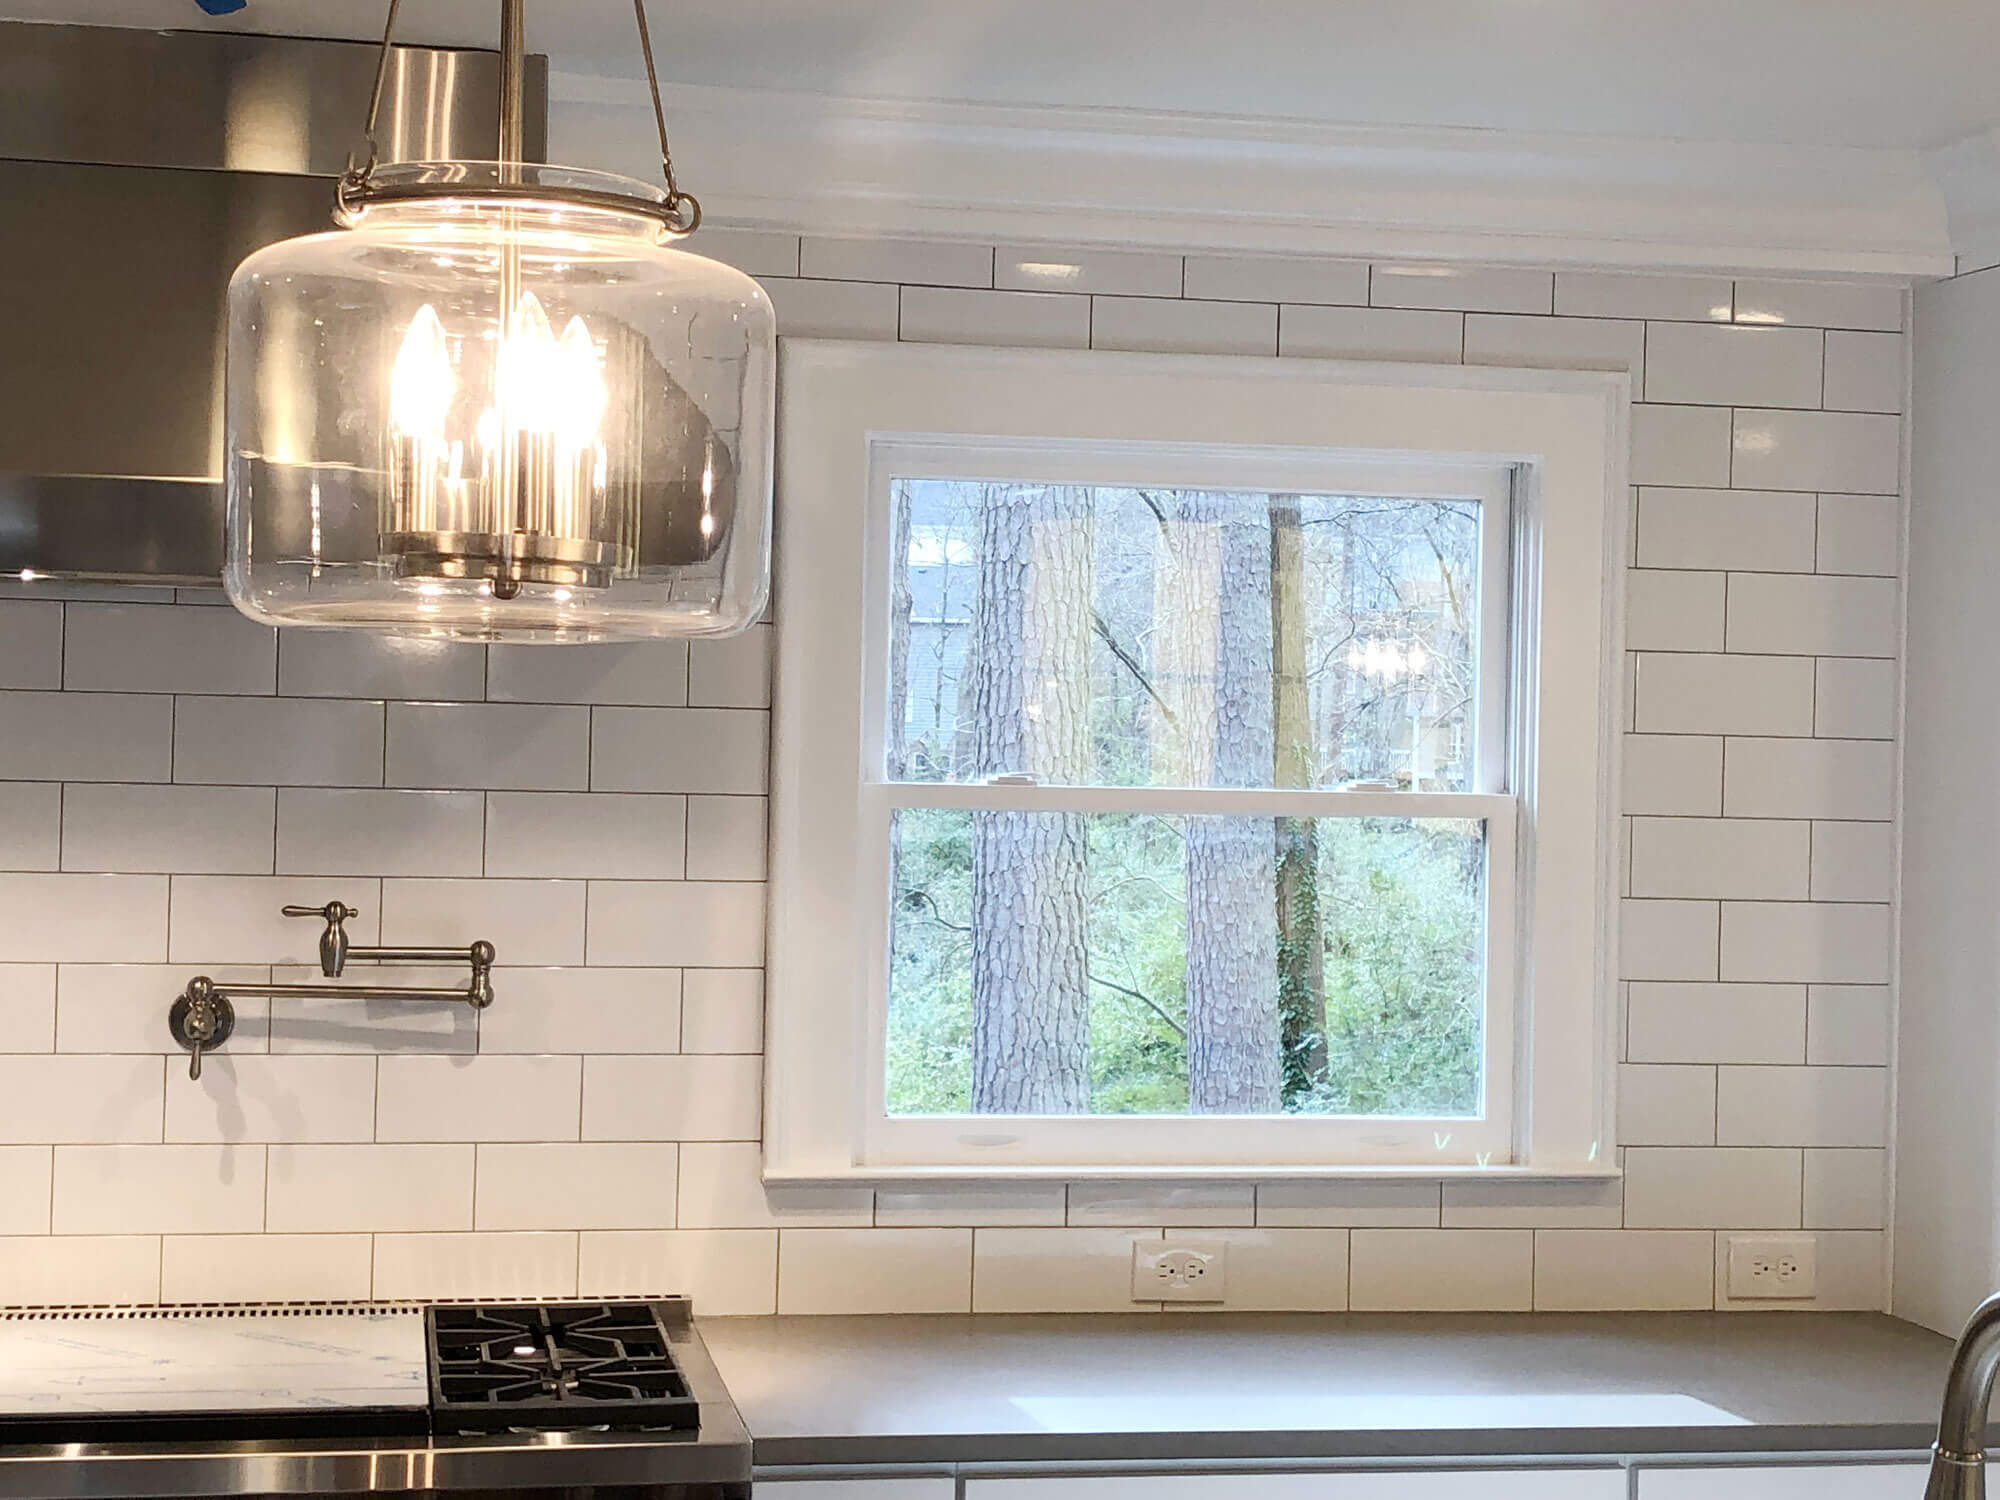 New-windows-as-well